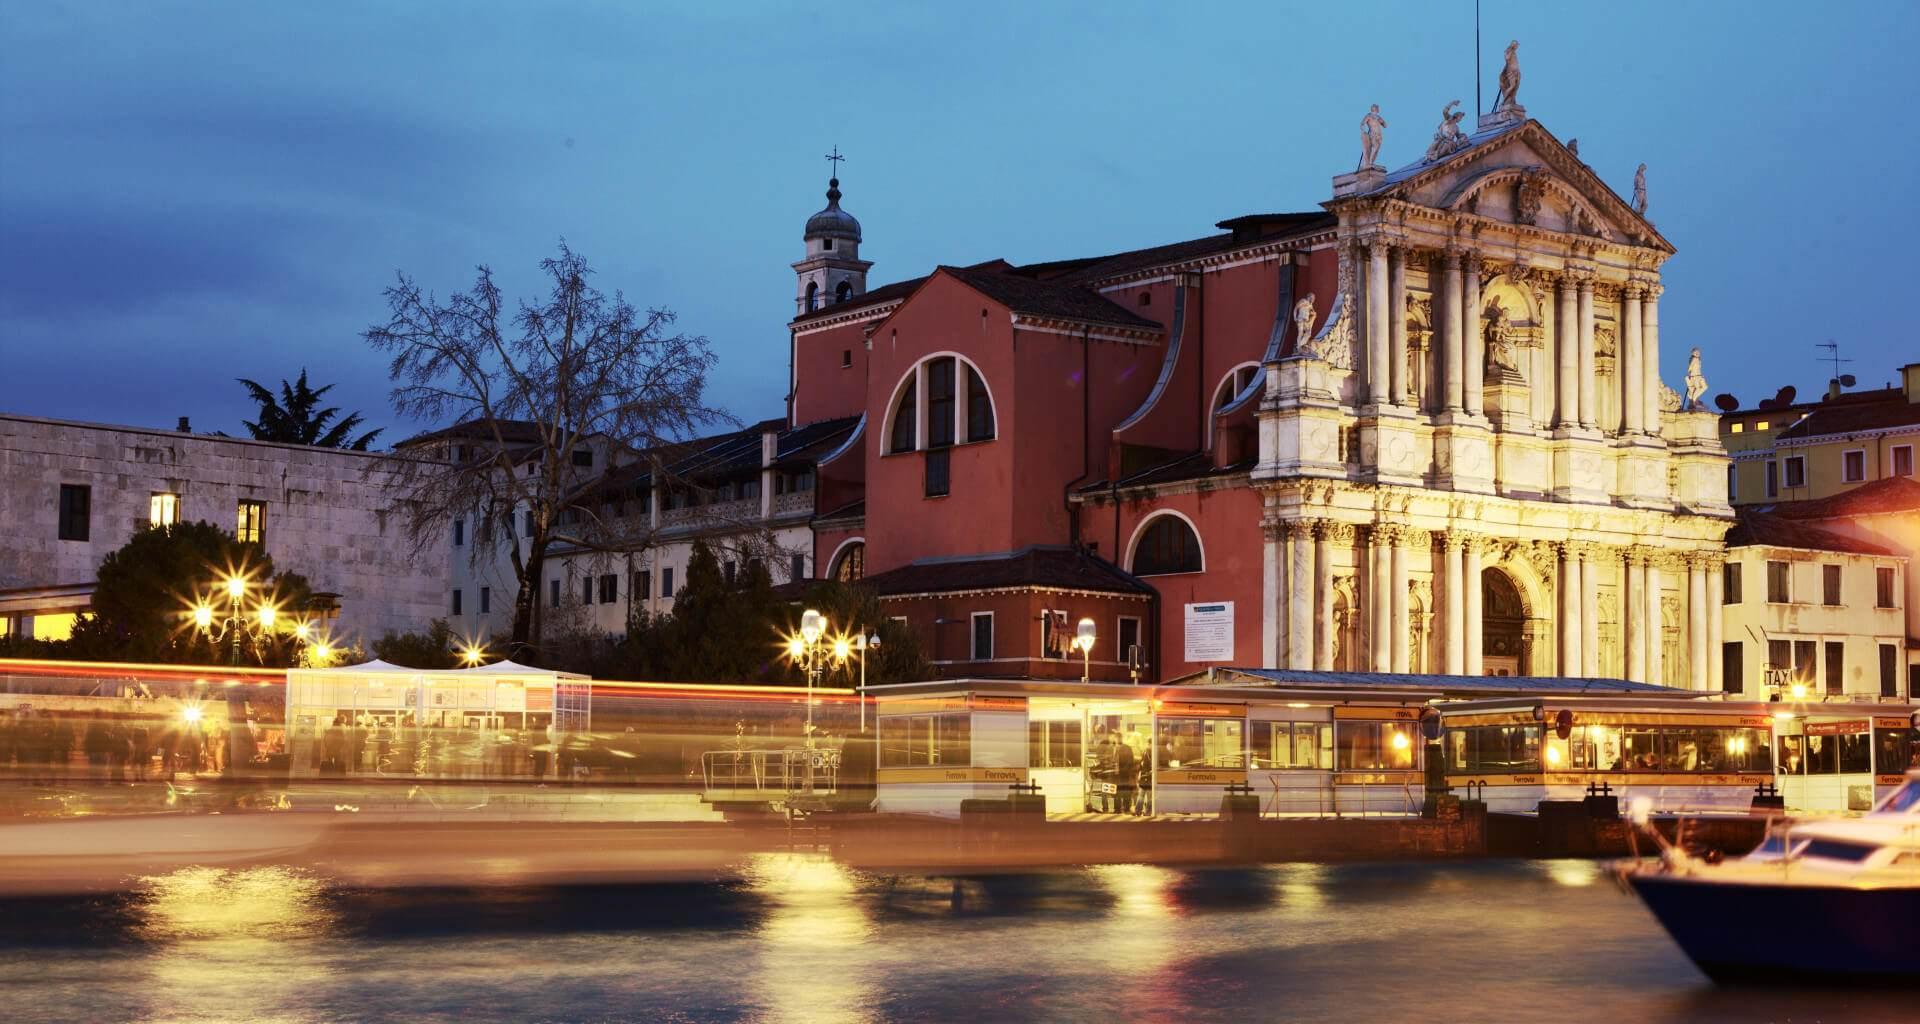 Hotels Venice Train Station Hotel Santa Lucia Venice Hotel Near